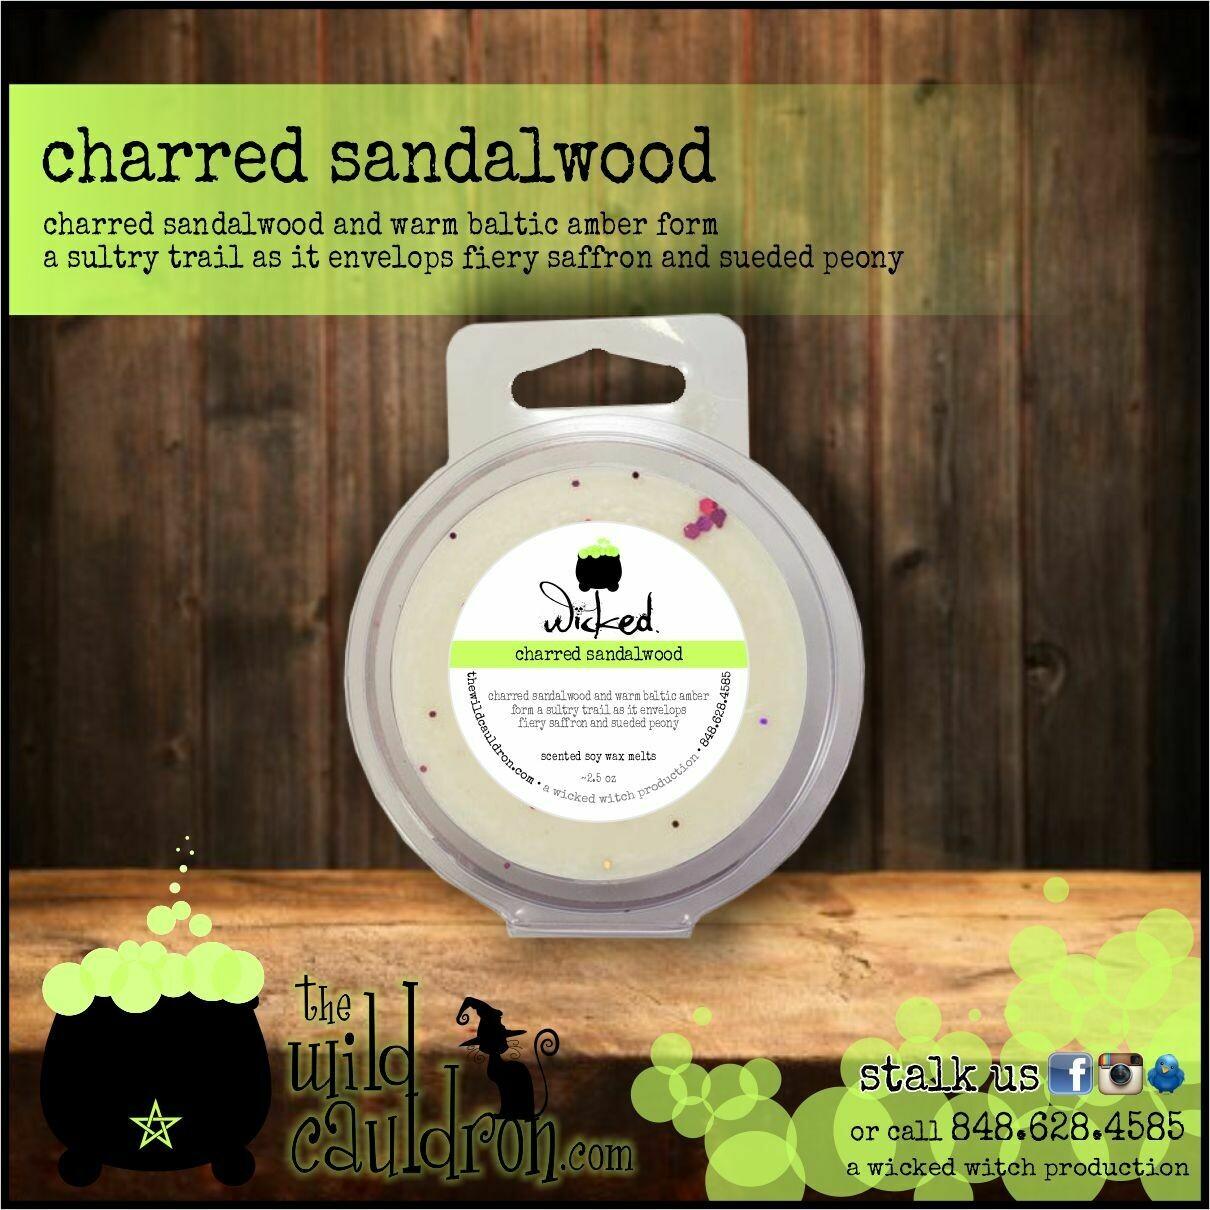 Charred Sandalwood Wicked Wax Melts